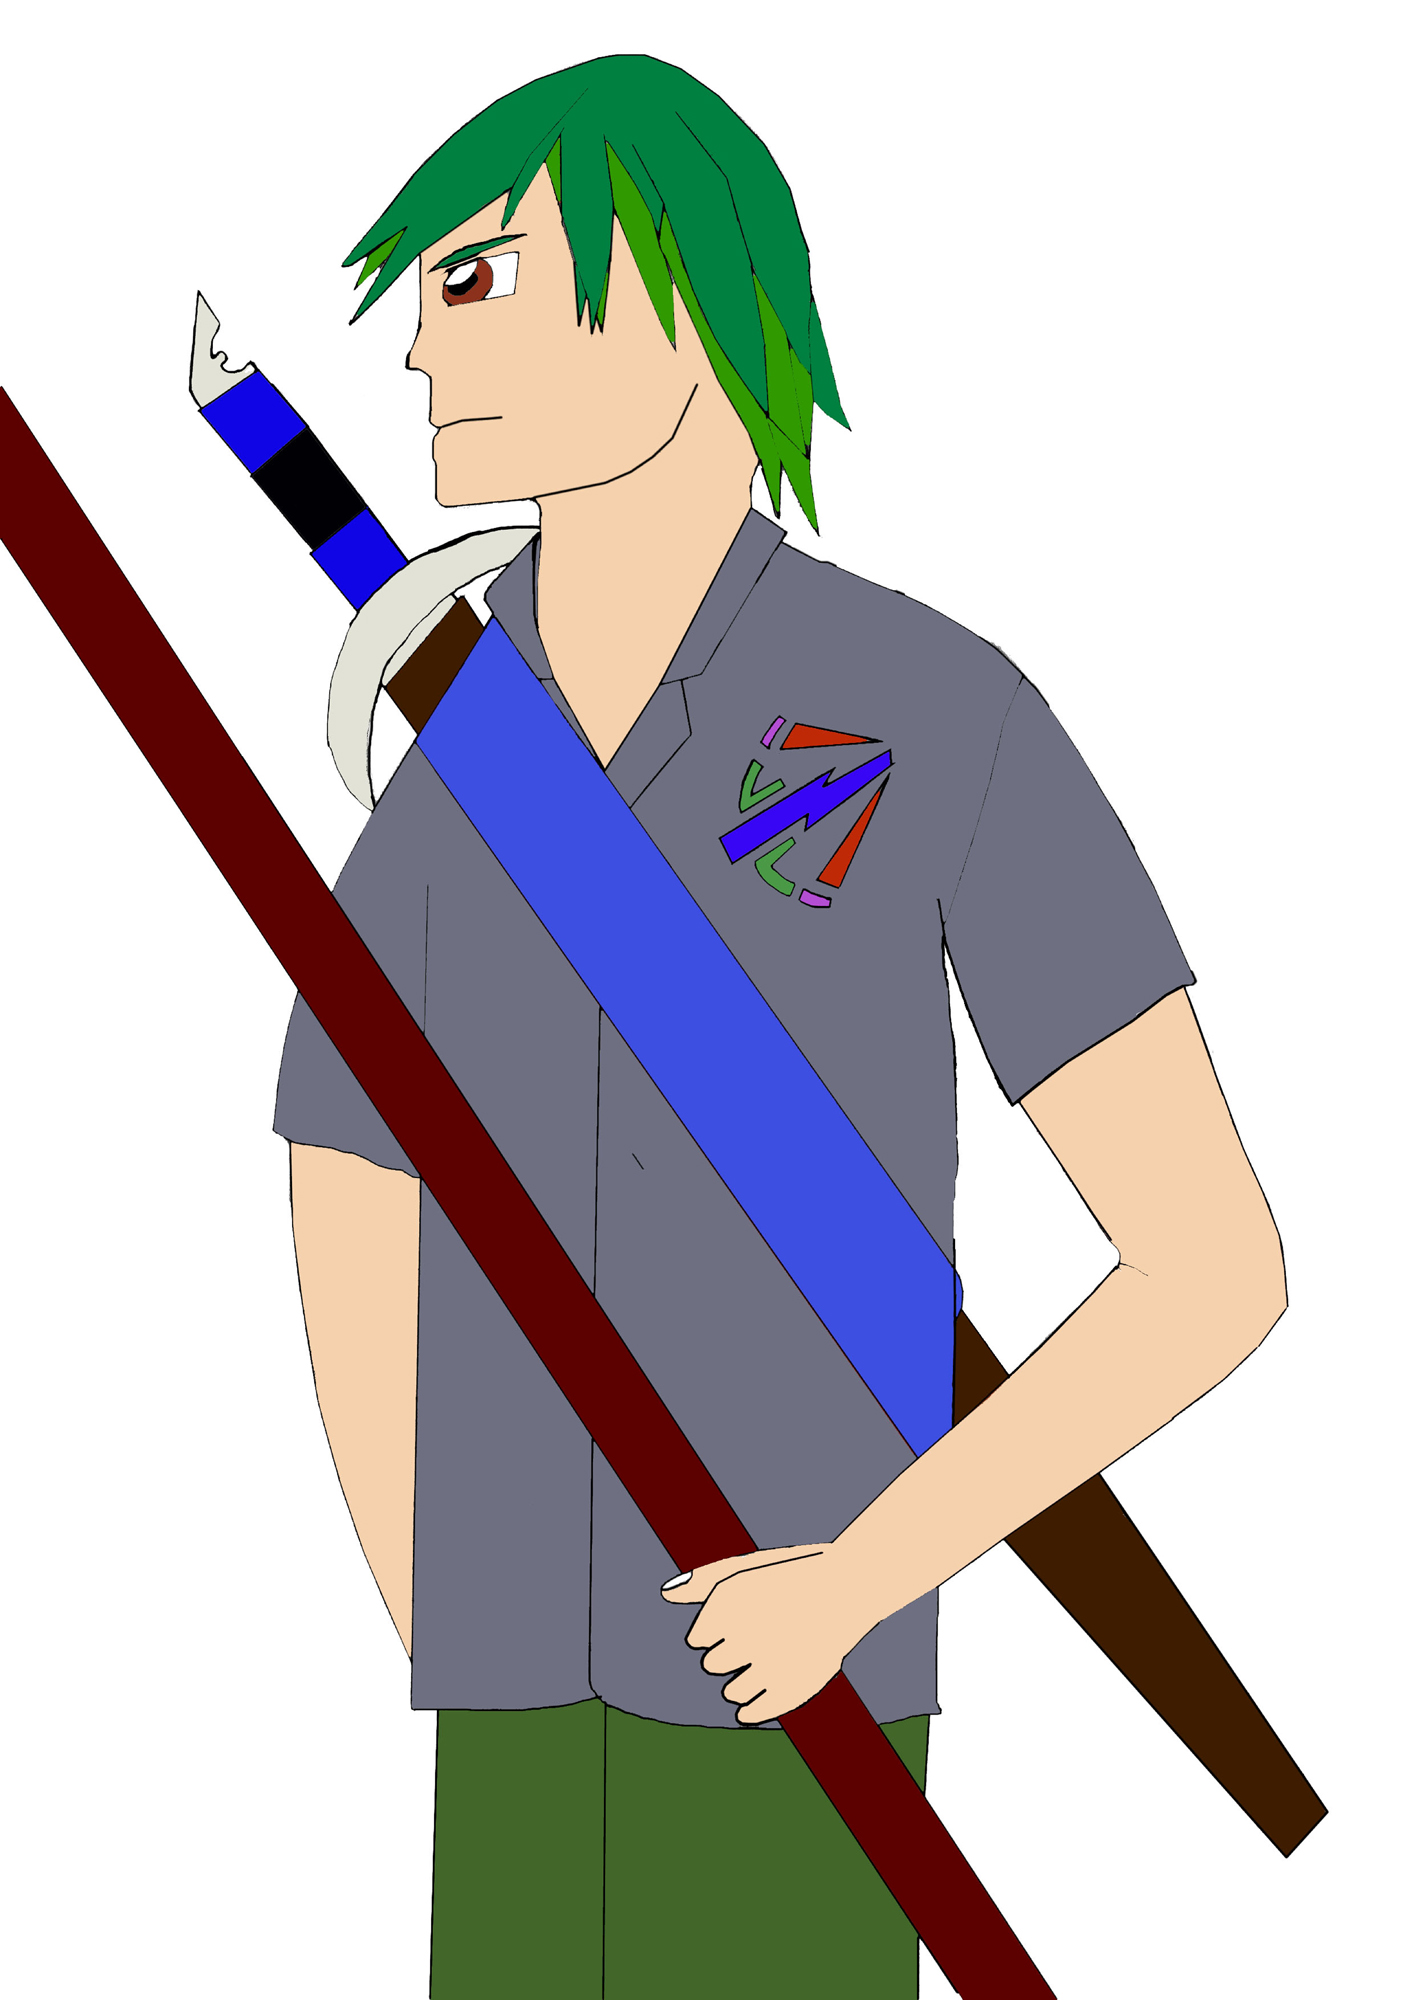 Manga Character no background